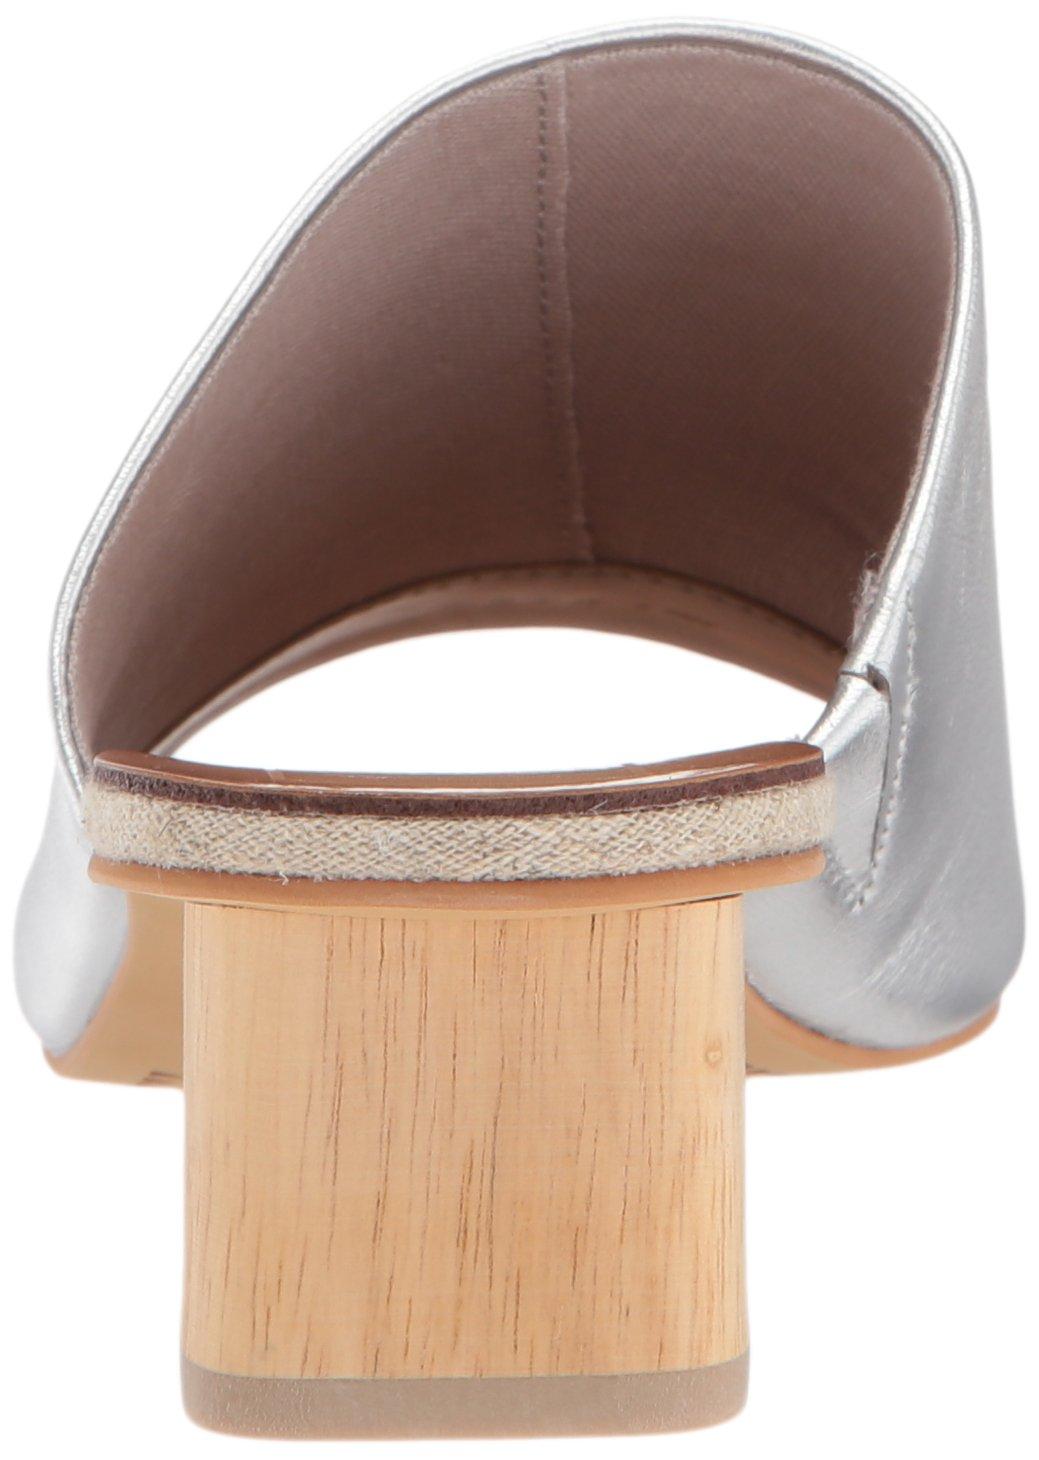 Dolce Vita Women's Kaira Slide Sandal B077NGYTL5 8 B(M) US|Silver Leather